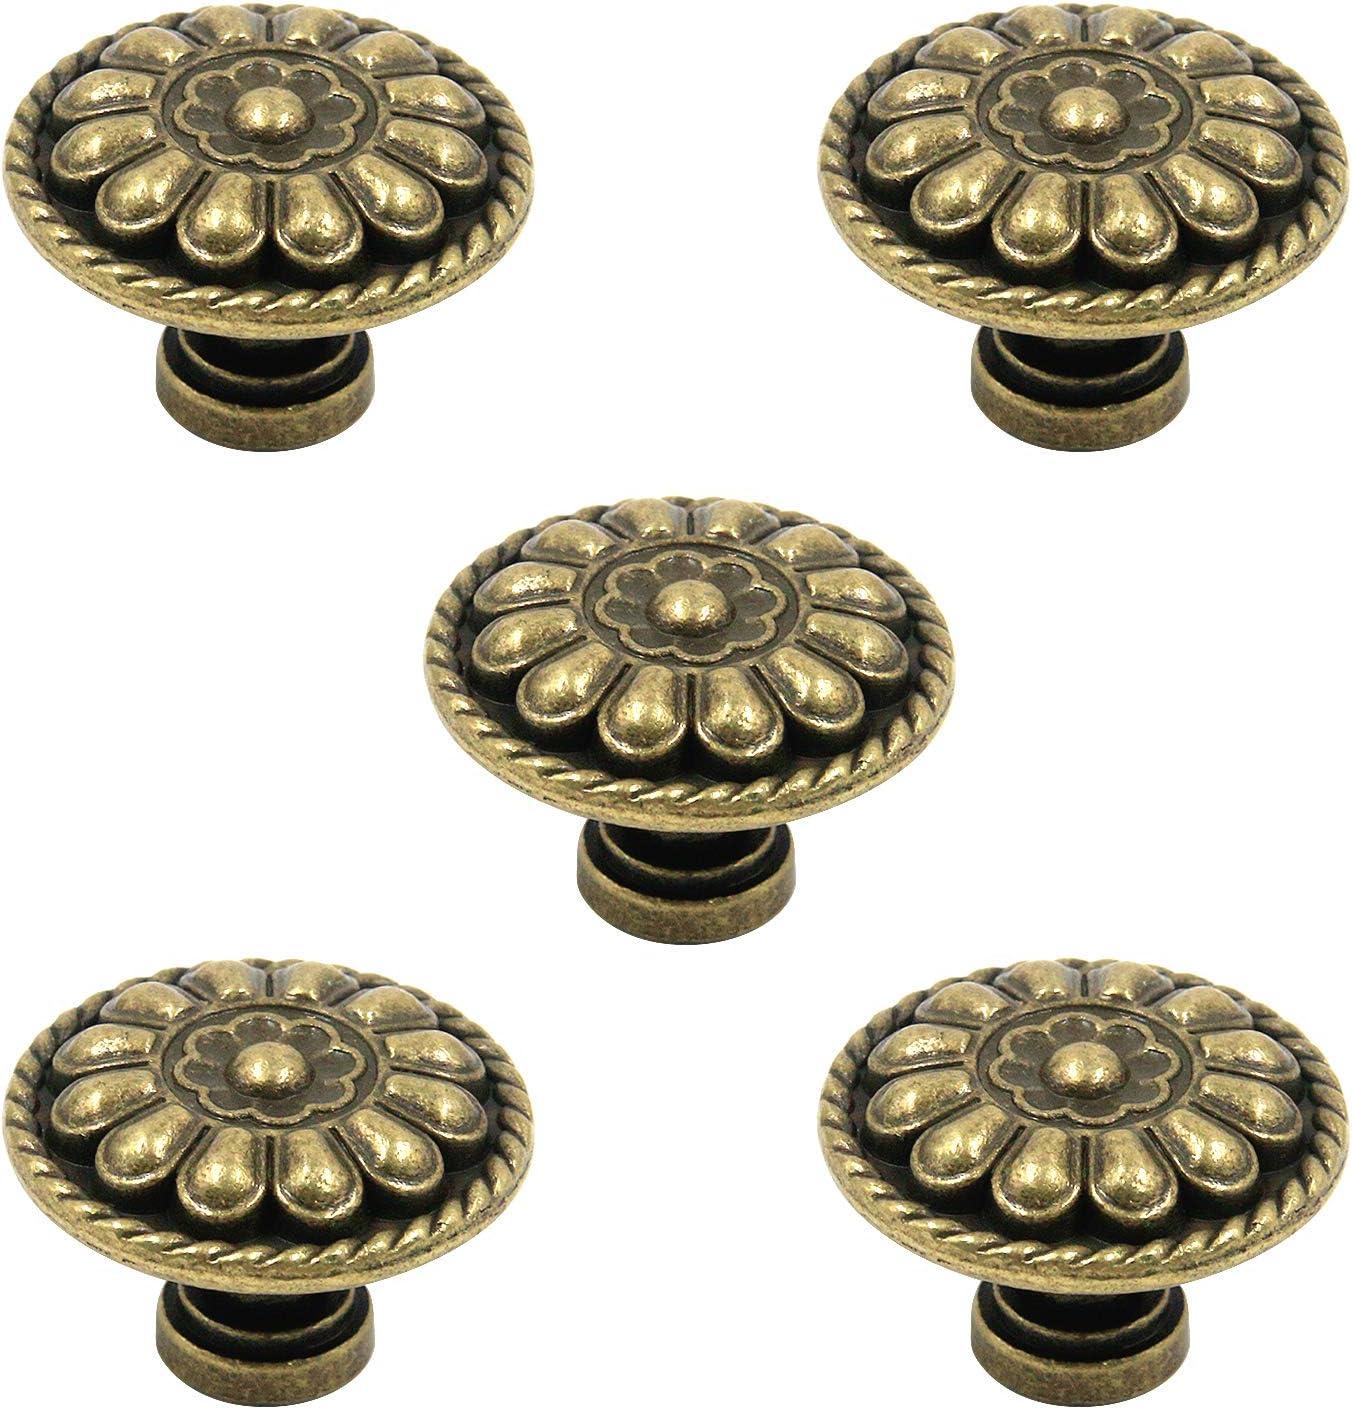 Tulead 5PCS Vintage Drawer Pulls Metal Dresser Knobs Jewelry Box Knobs Pull Knobs Bronze Round Drawer Pulls 1.3